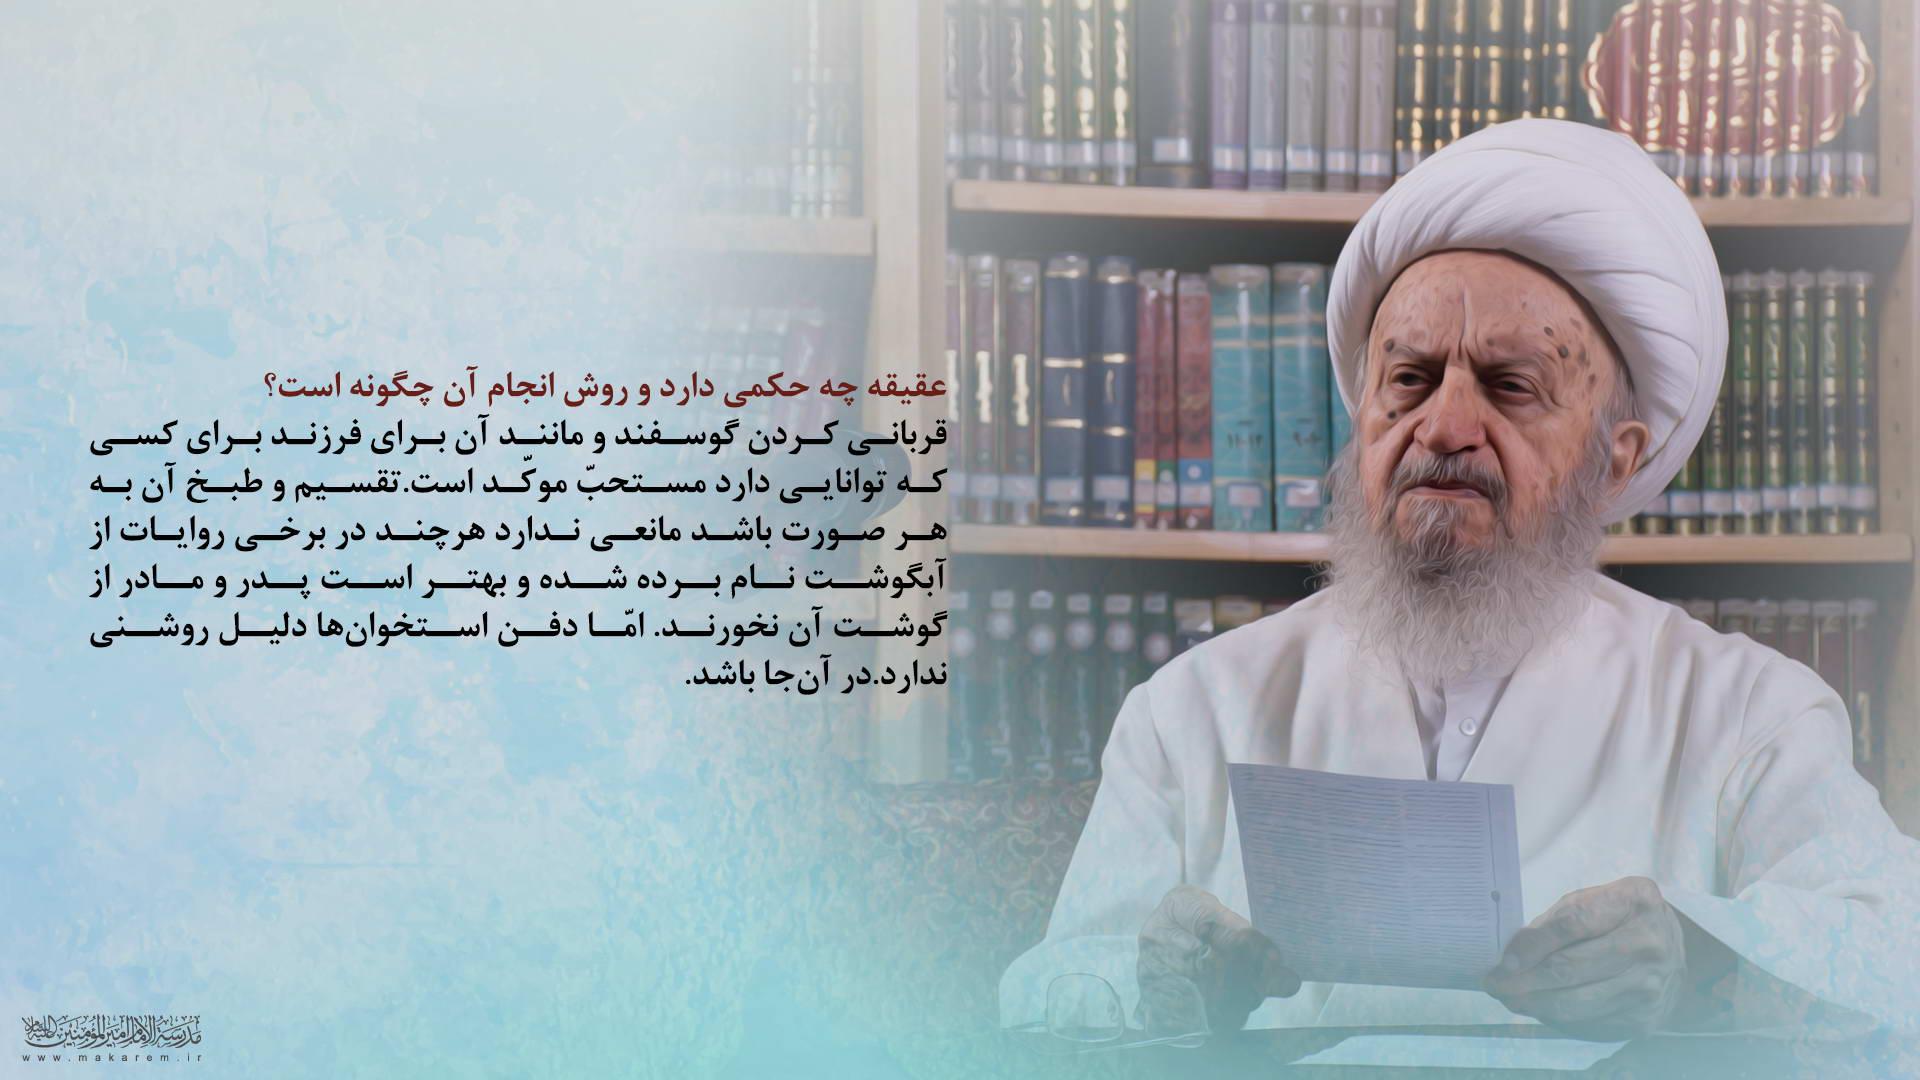 کثیر 05-مدرسه الامام امیر المومنین (ع)